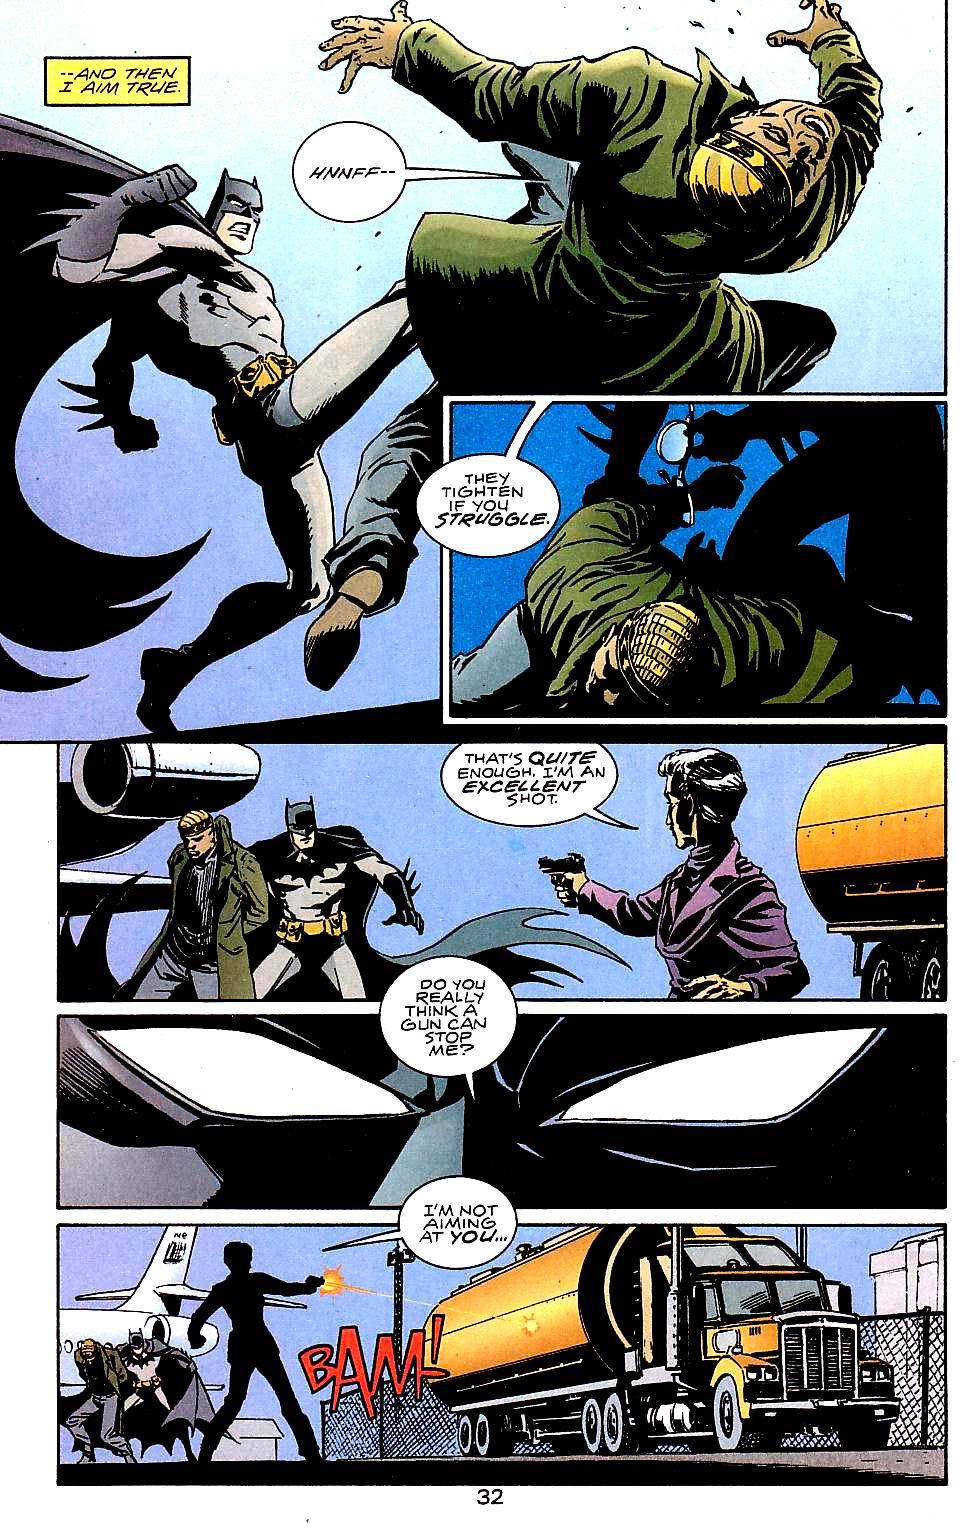 batman family 08 of 08 (31) Batman Celia Freeway.jpg